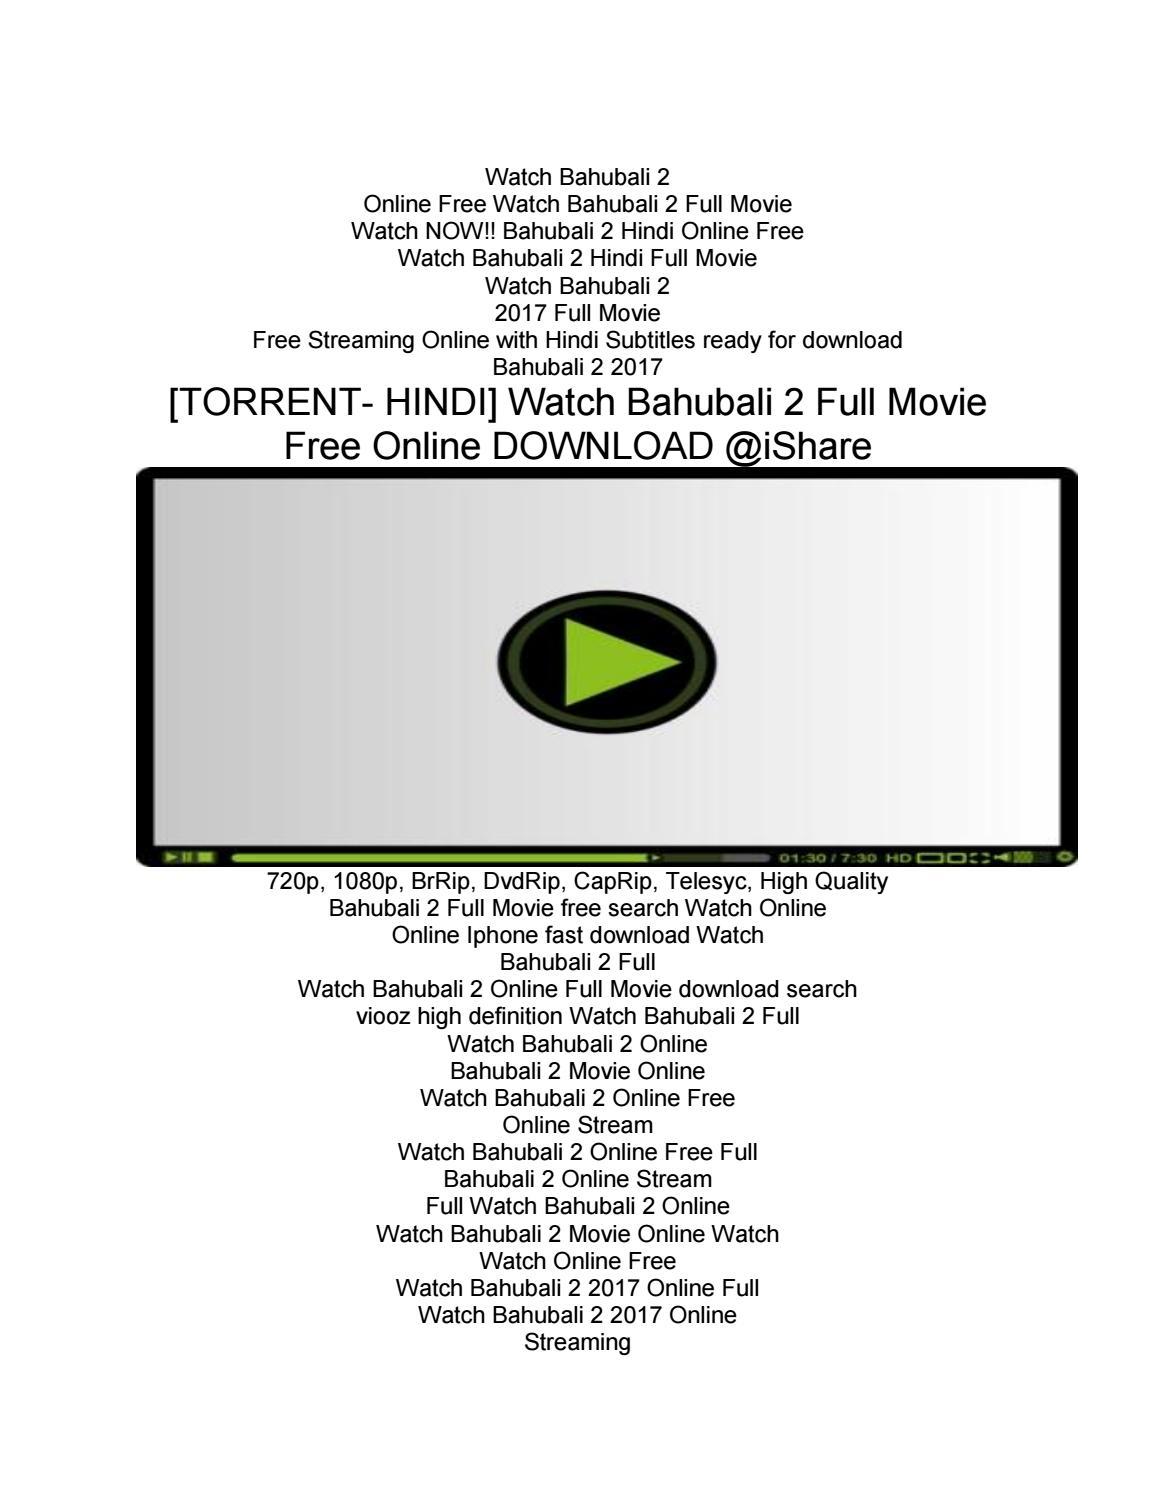 bahubali 2 full movie watch online in hindi free download